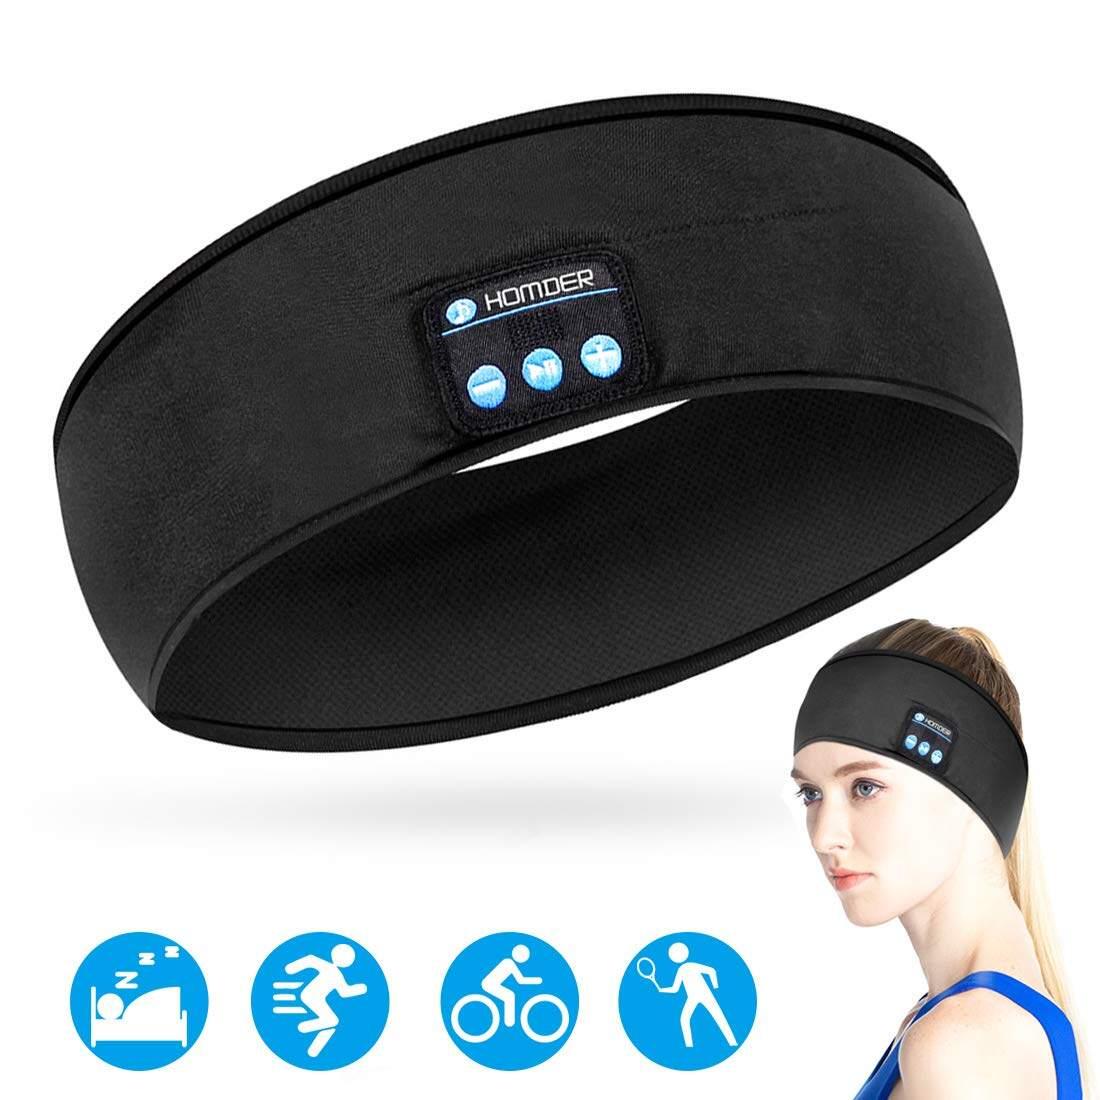 Homder Sleep Headphones Bluetooth Headband Stereo Wirless Bluetooth 5 0 Headset Unisex Sport Sweatband For Working Out Exercising Skating Snowboarding Hiking Lazada Ph